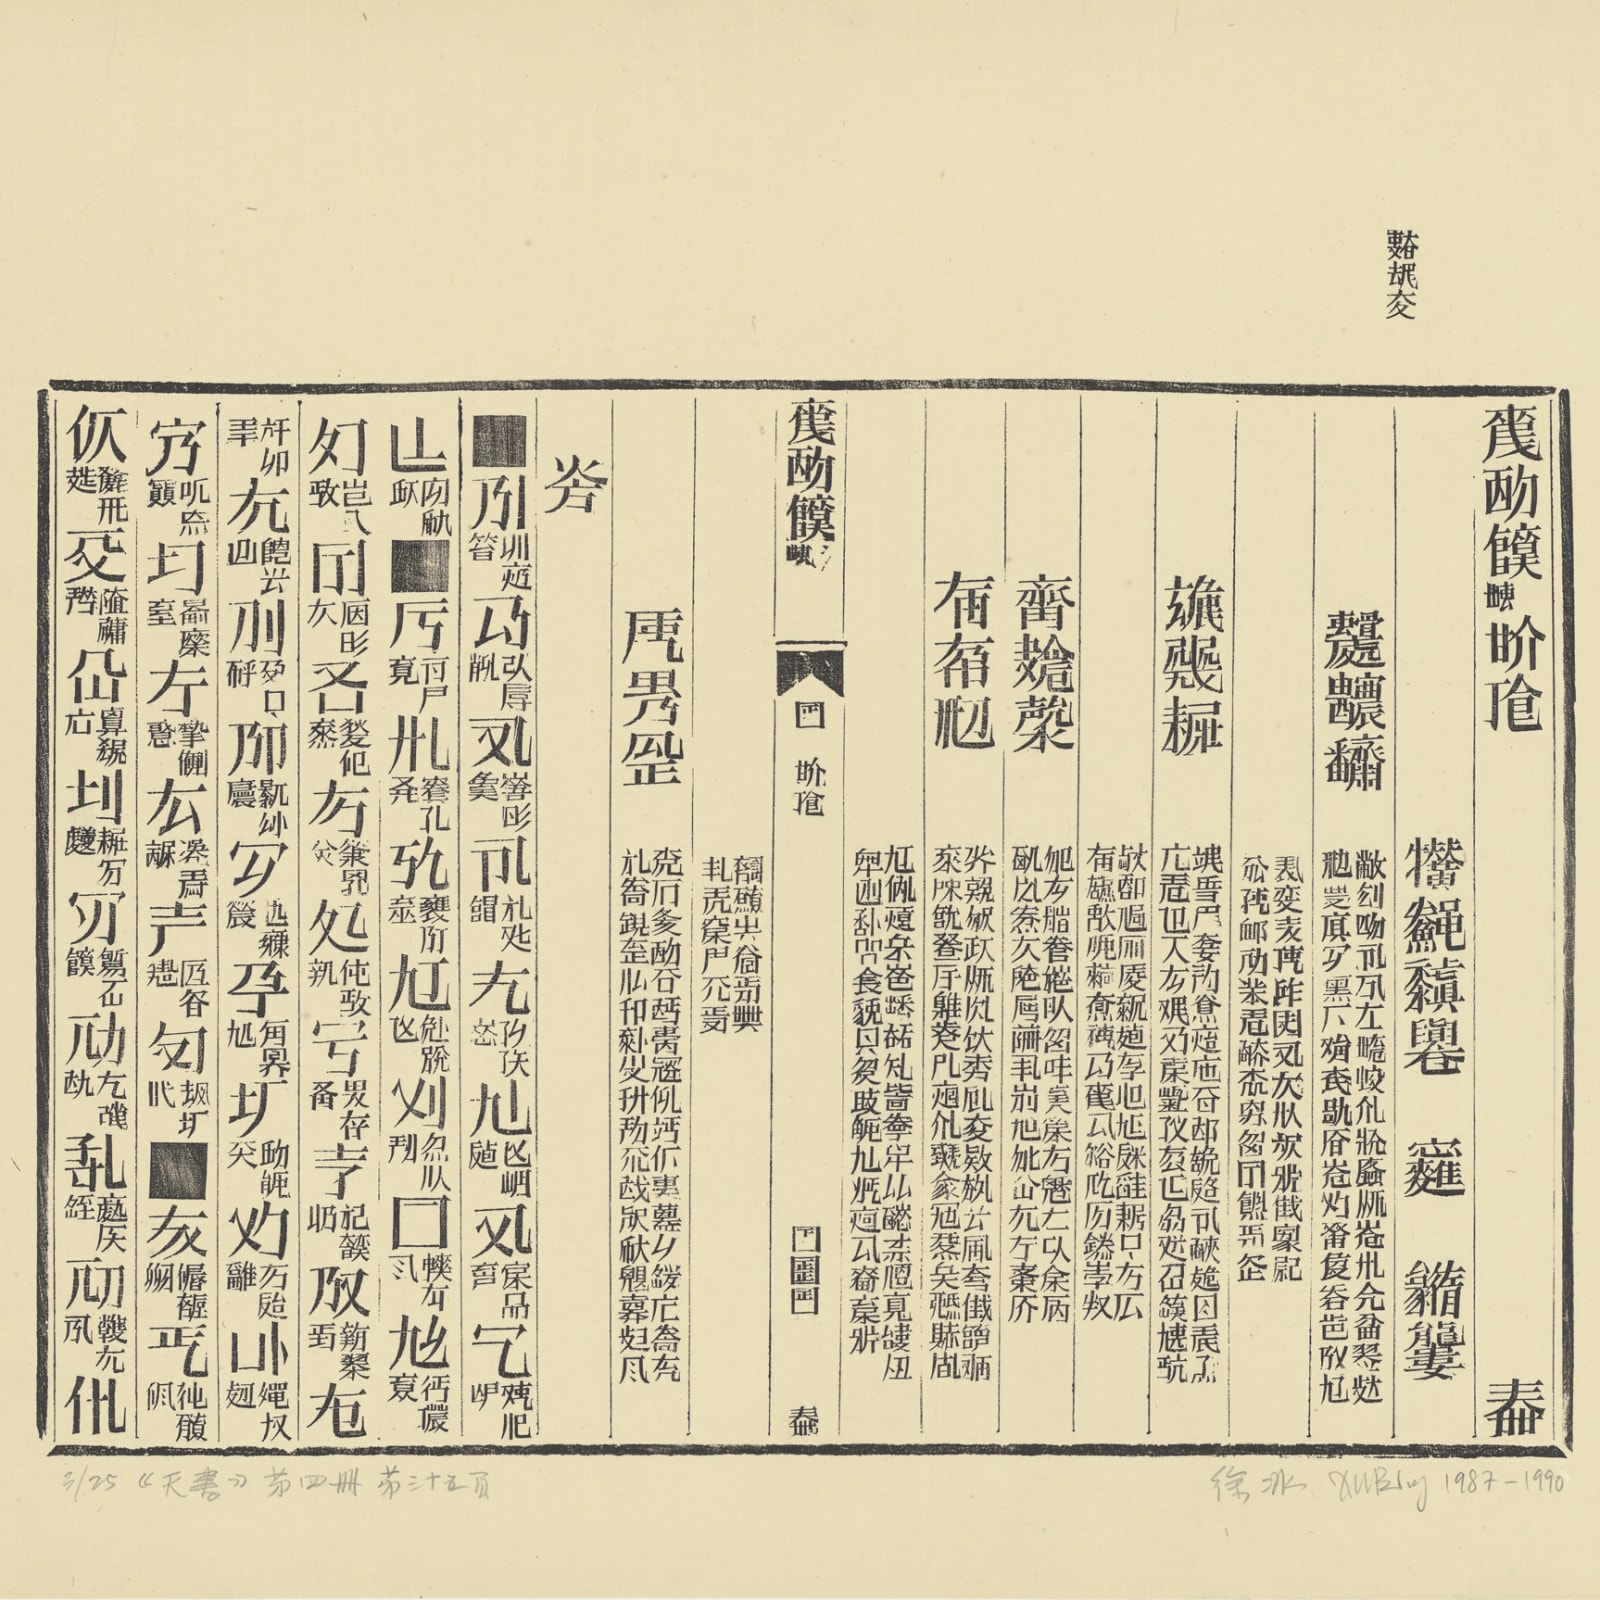 Xu Bing 徐冰, Book from the Sky, Volume 4, Page 35 《天书》第四册第三十五页, 1987-90